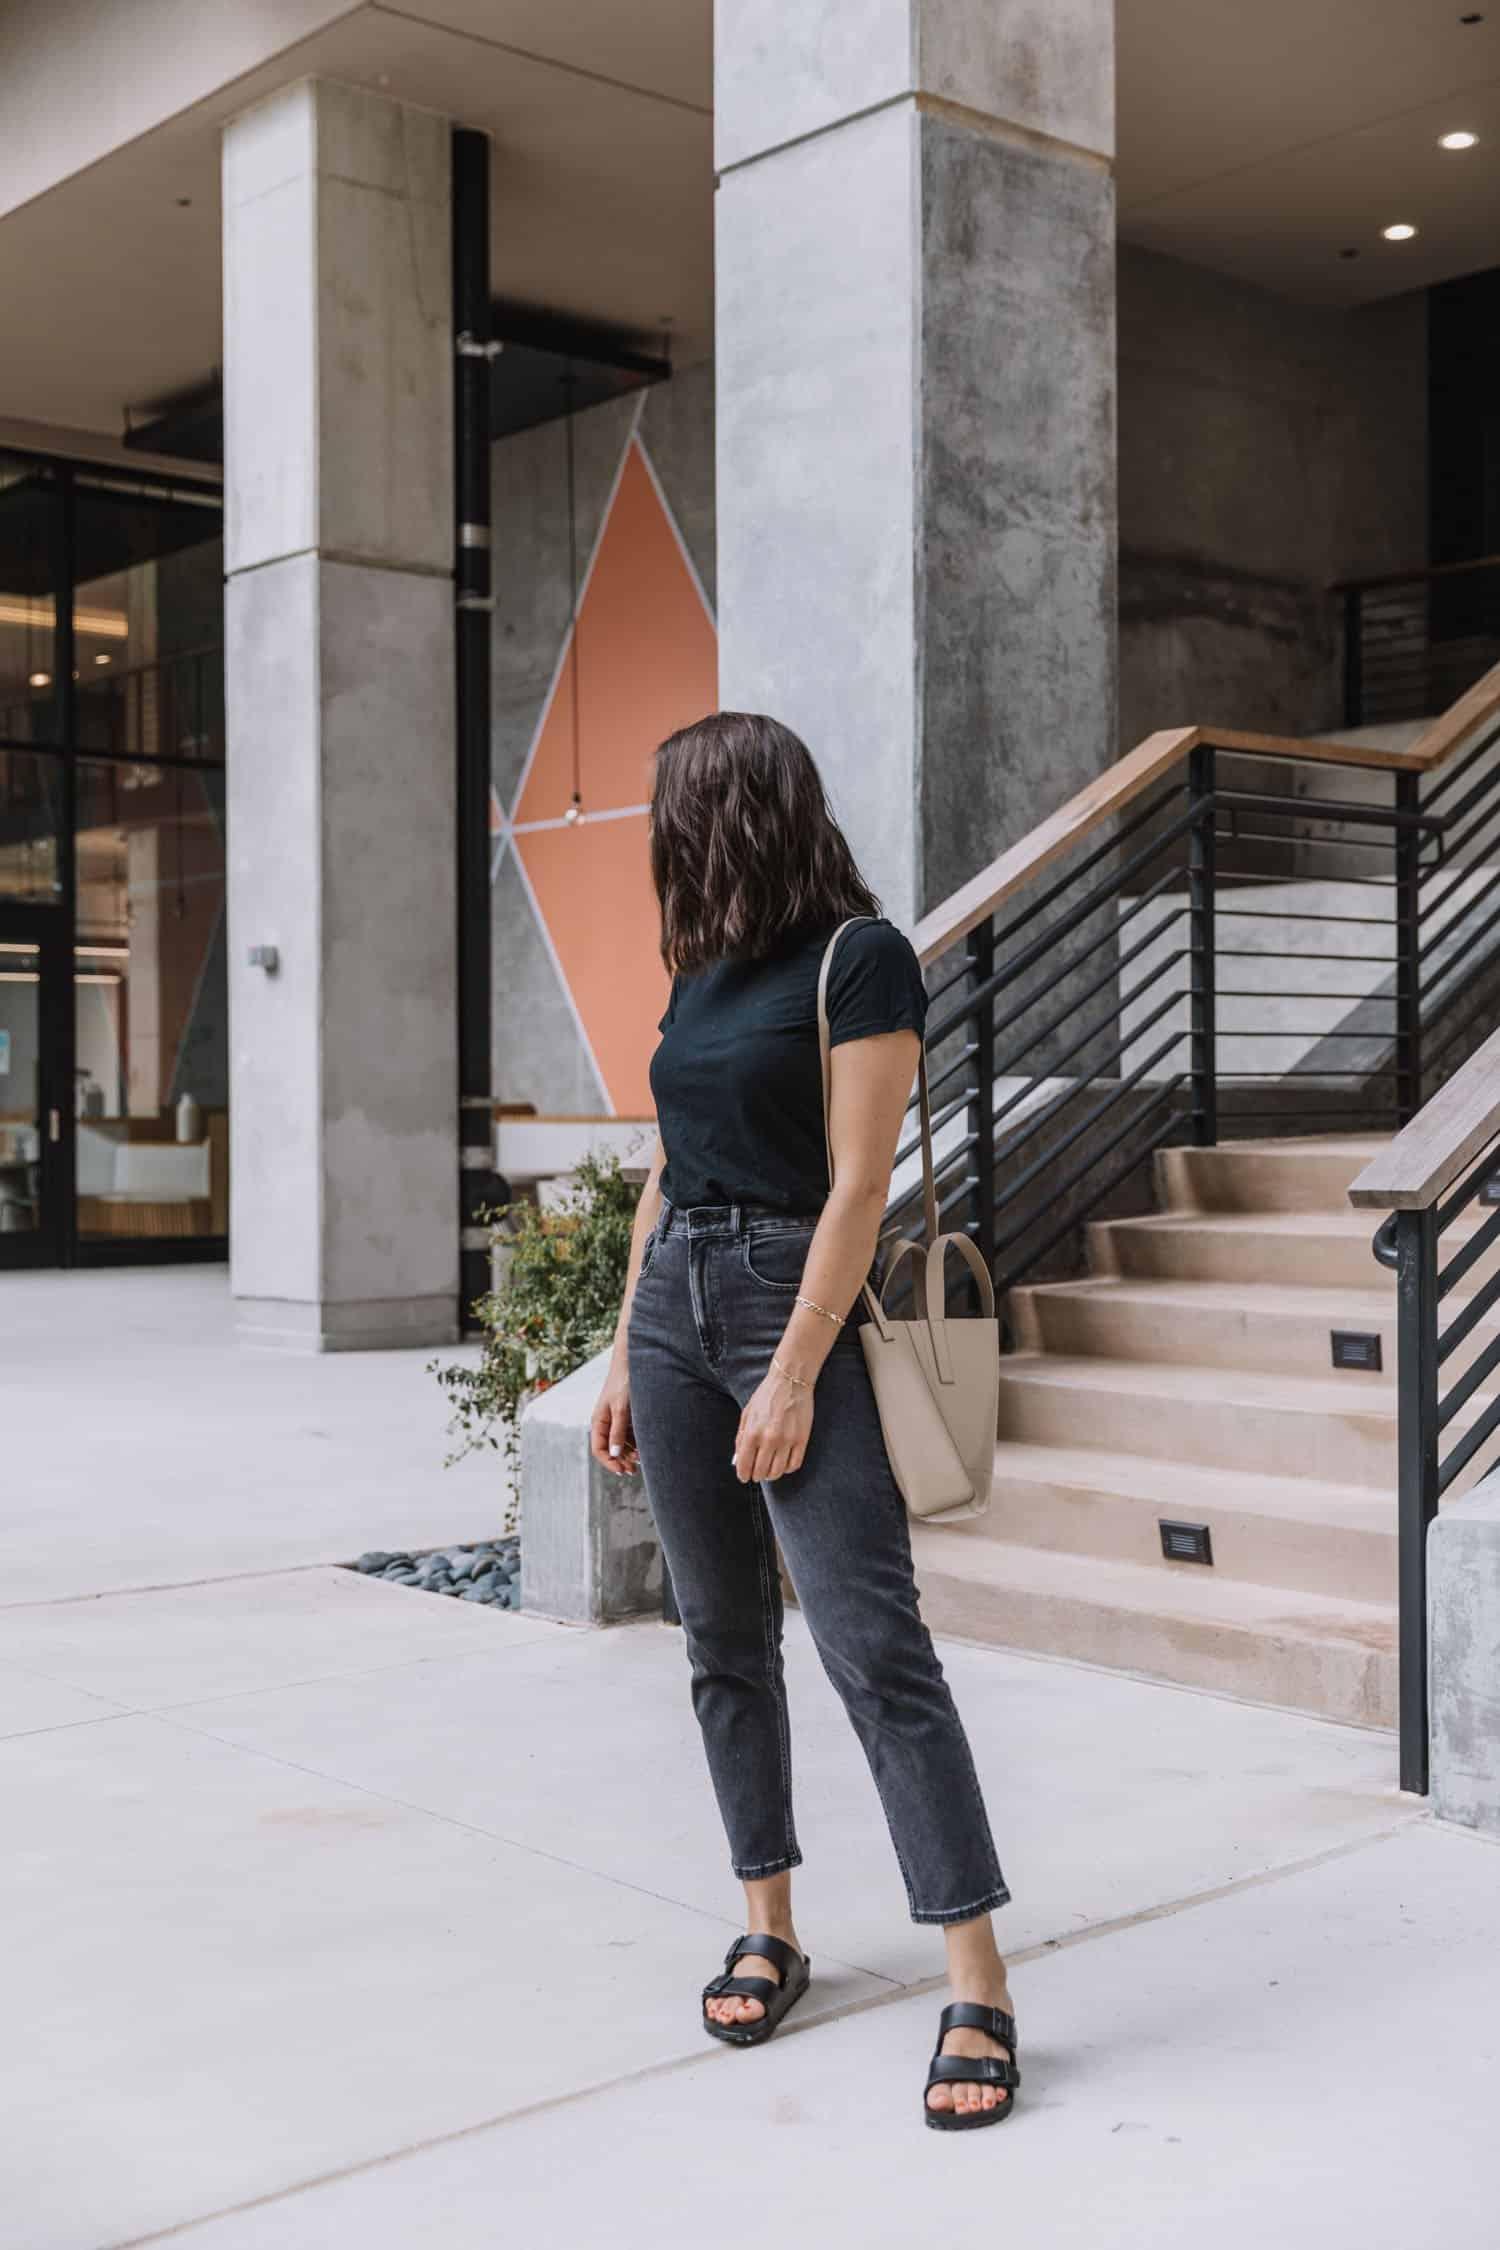 Jessica Camerata styles the Birkenstock EVA Arizona sandal with black jeans